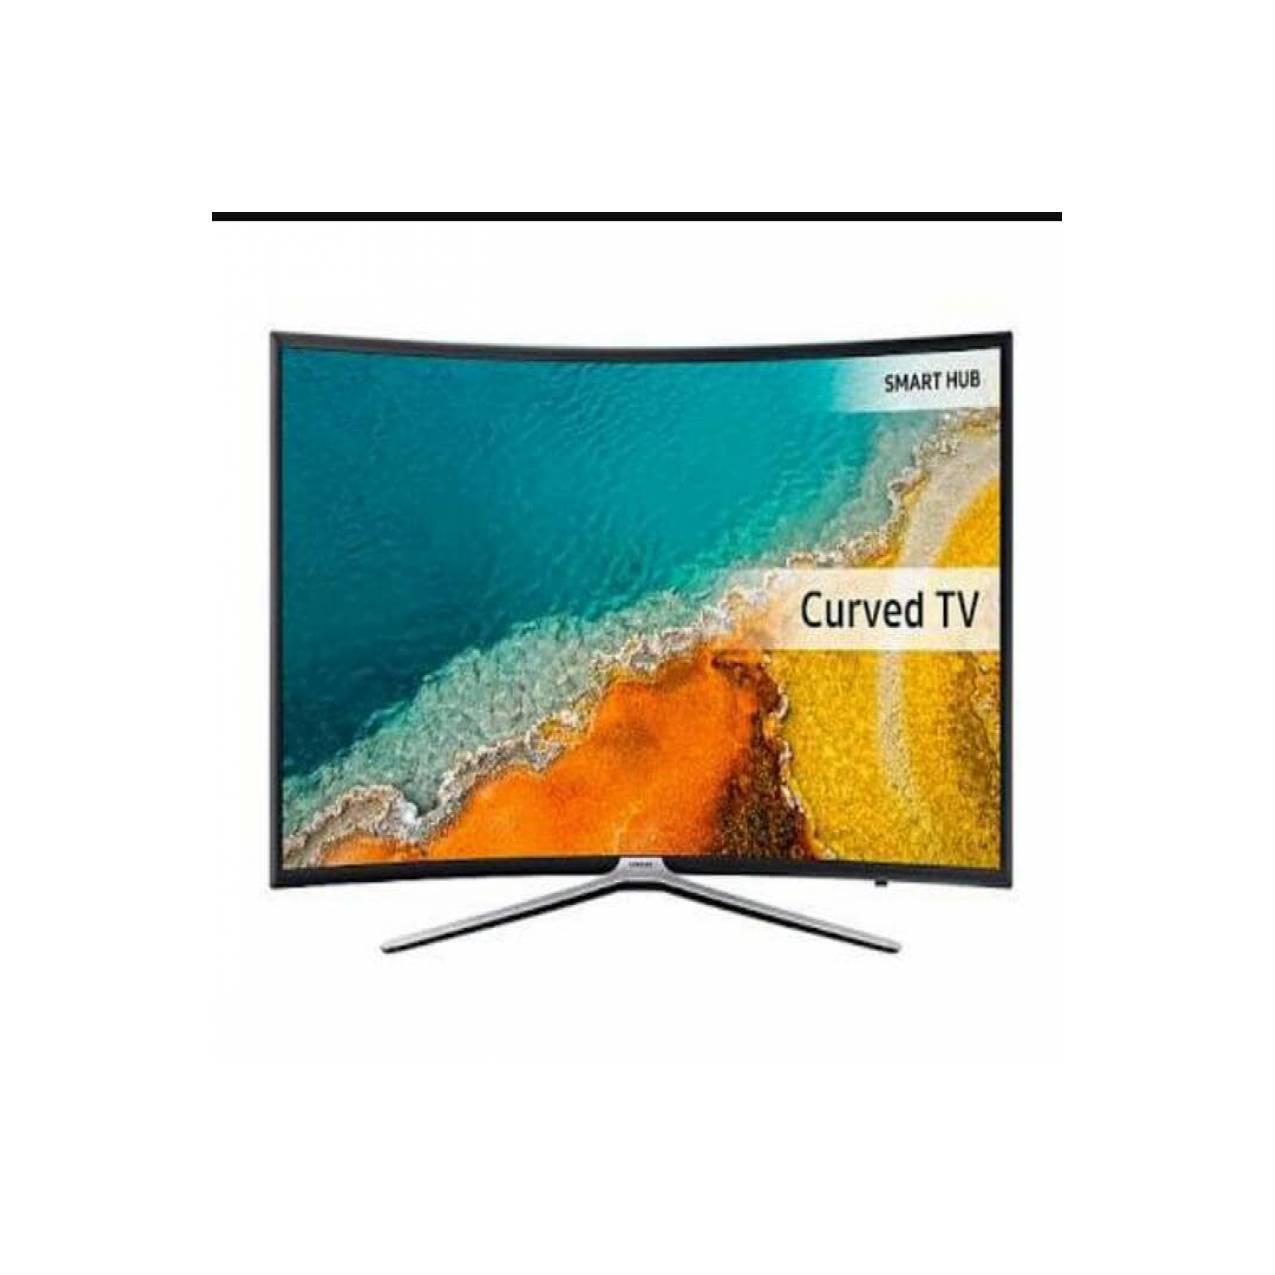 Smart Tv Samsung 40K6300 Curved Full HD Garansi Resmi Murah